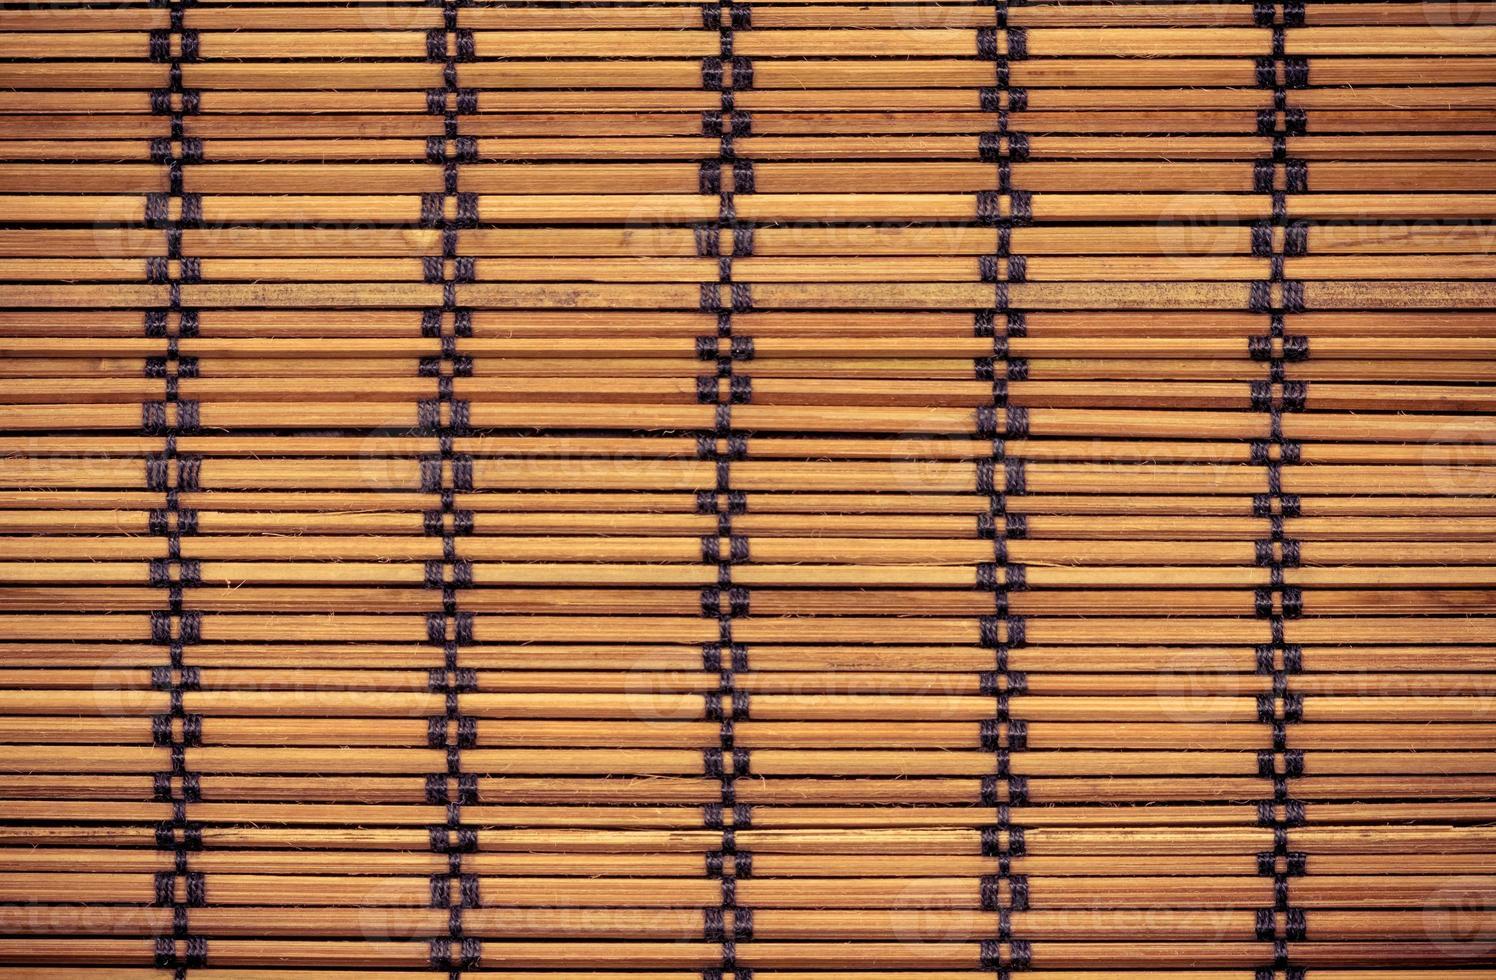 textura de madeira de bambu para o fundo foto